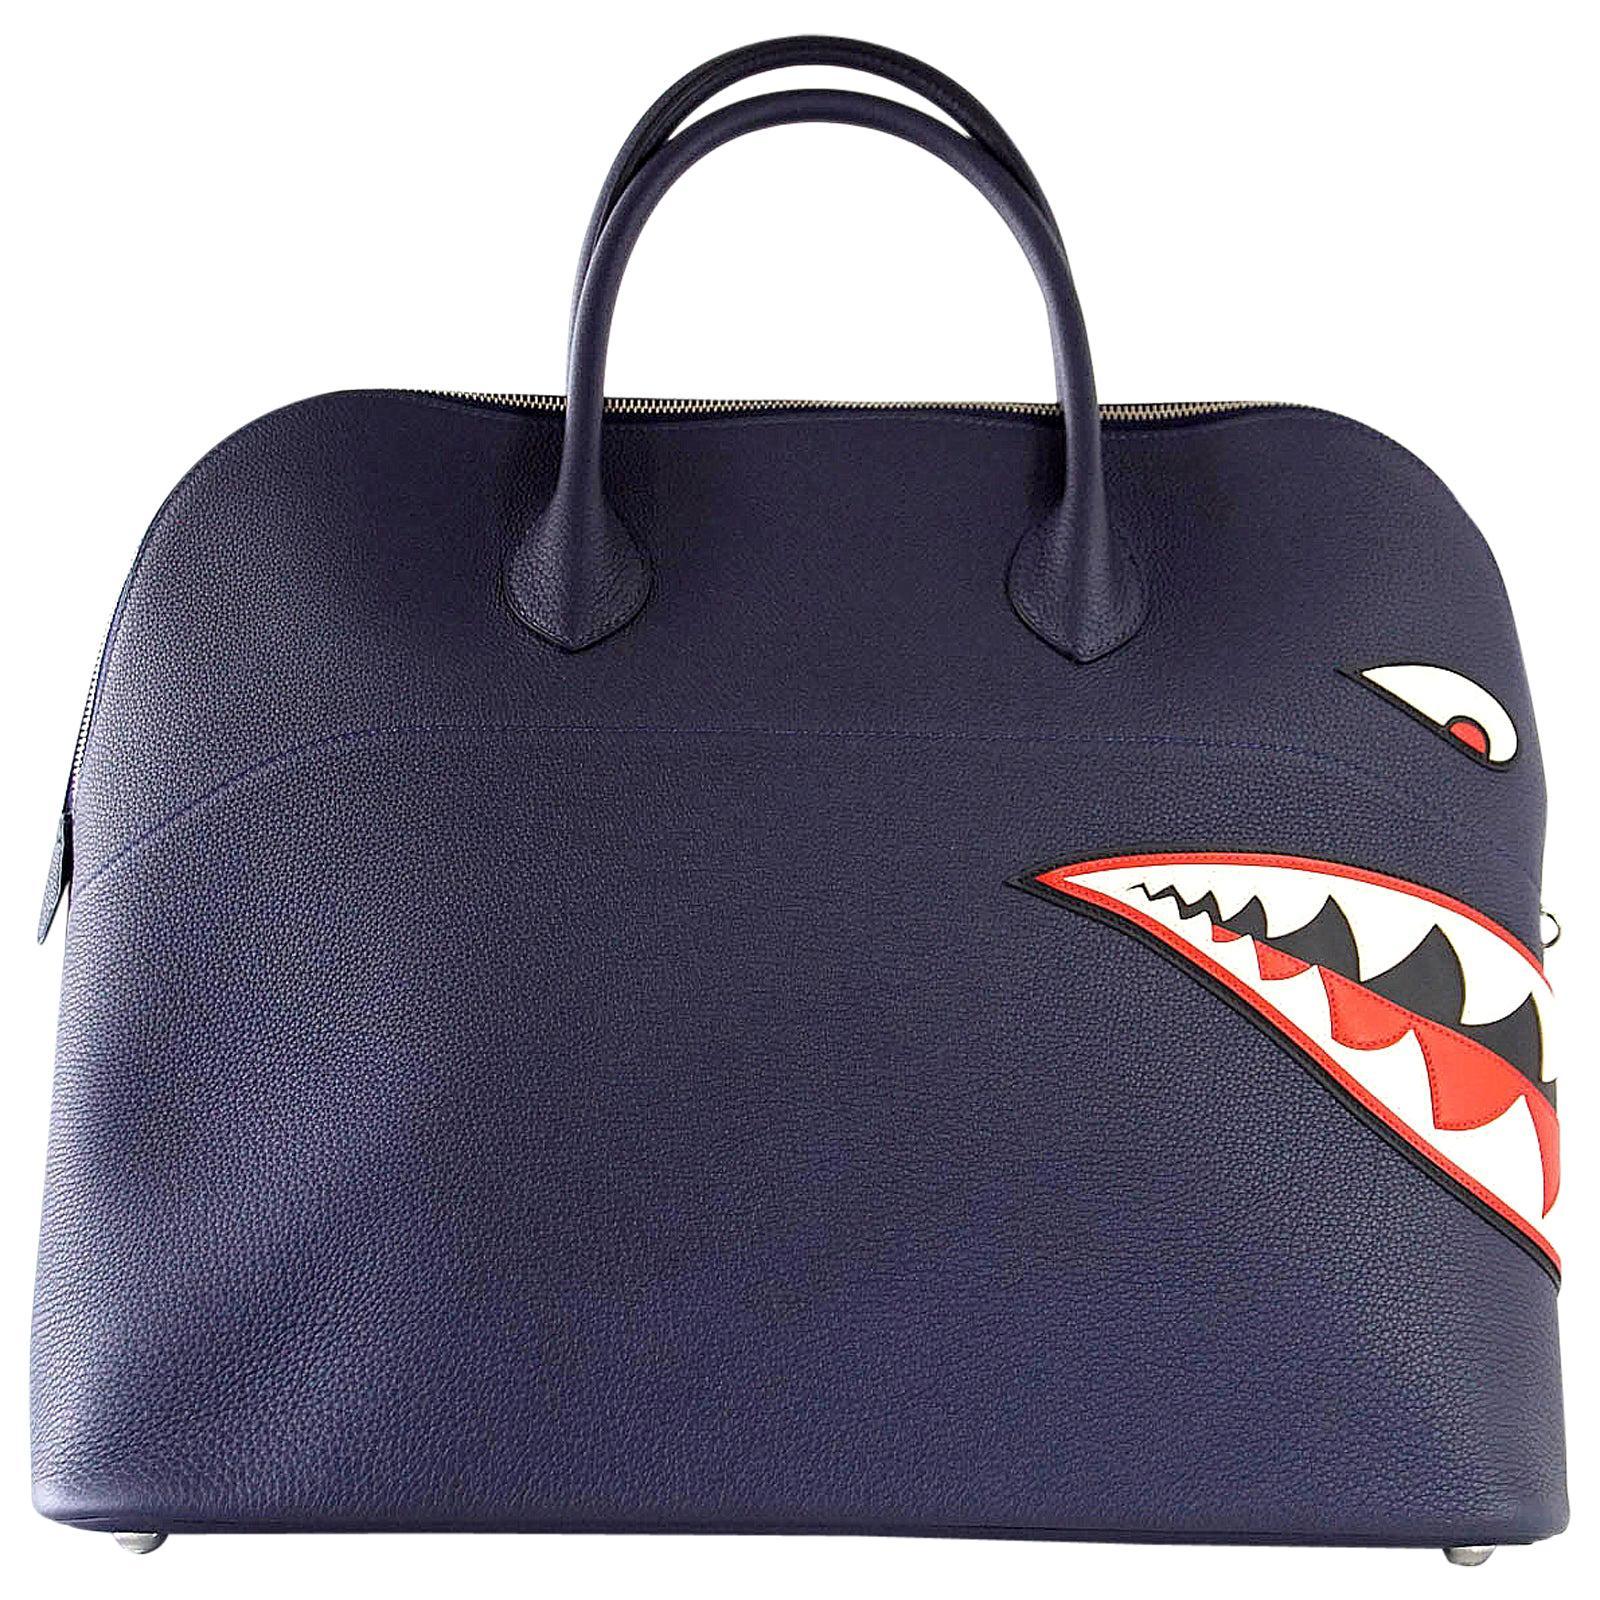 Hermes Bolide Runway Shark Monster Bag Unisex Blue Indigo Limited Edition